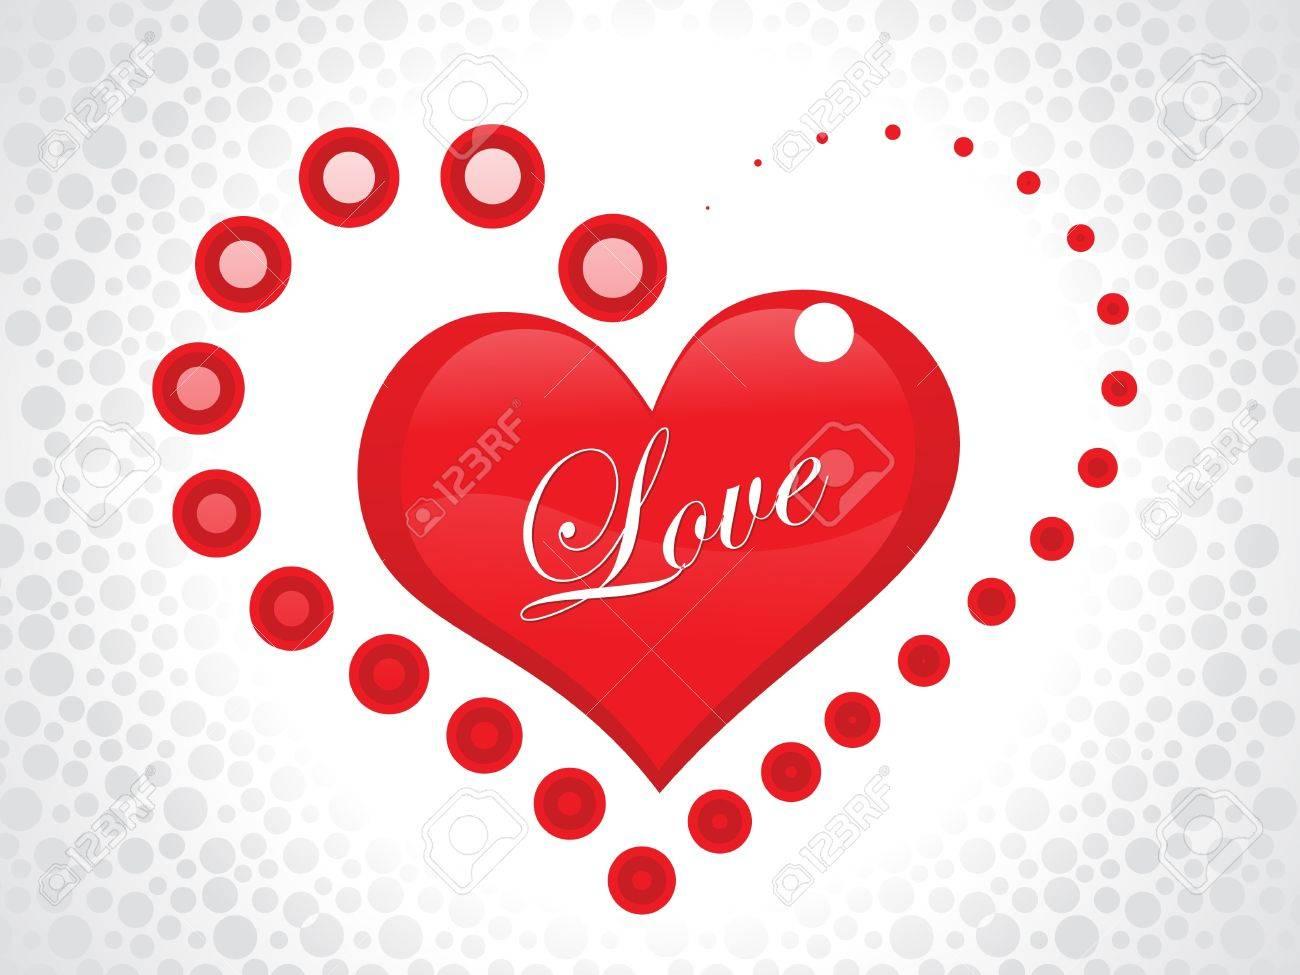 Abstract Love Wallpaper Vector Illustration Royalty Free Cliparts